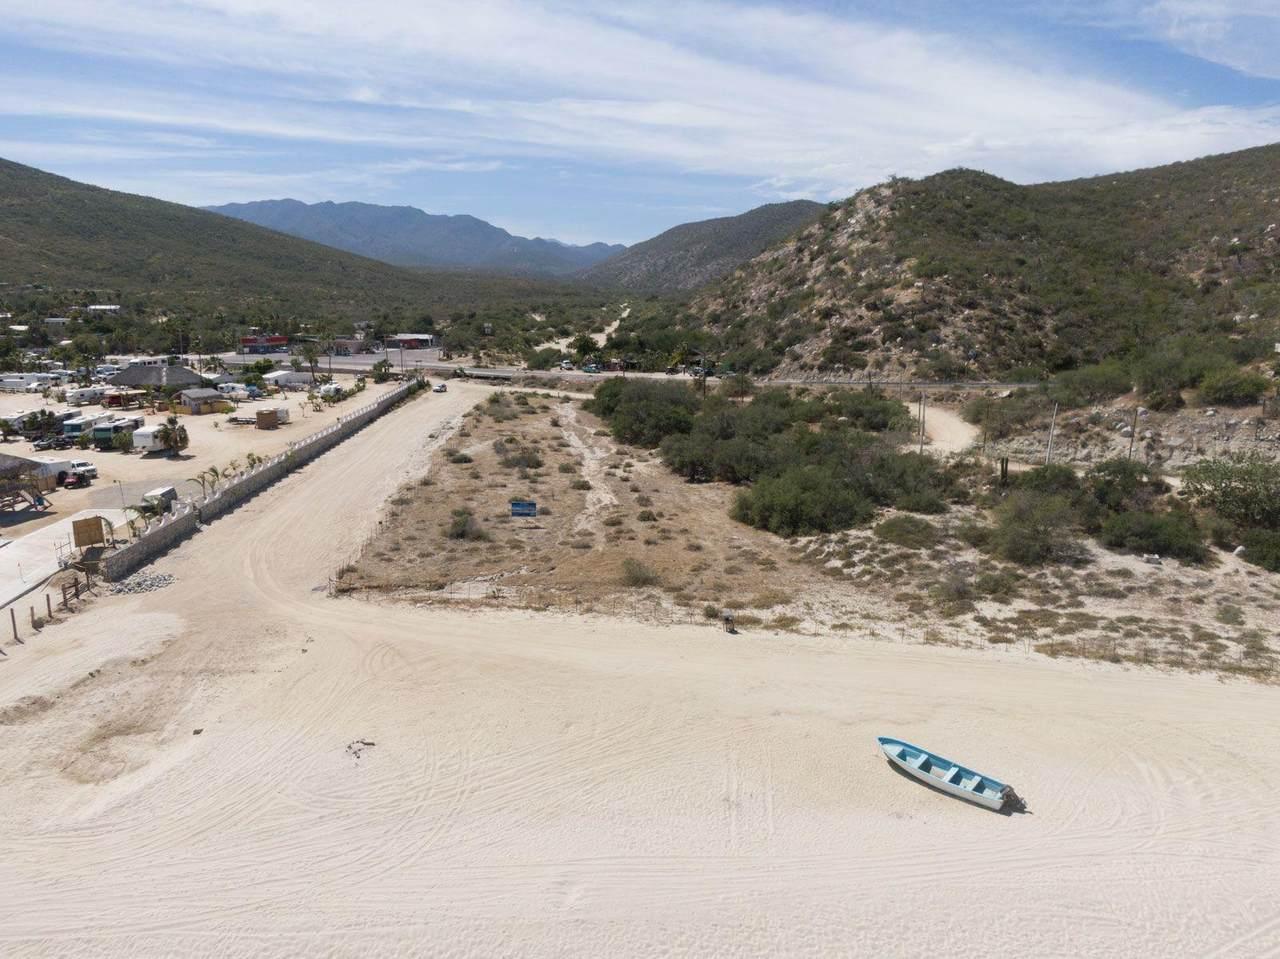 Carretera Transpeninsular - Photo 1